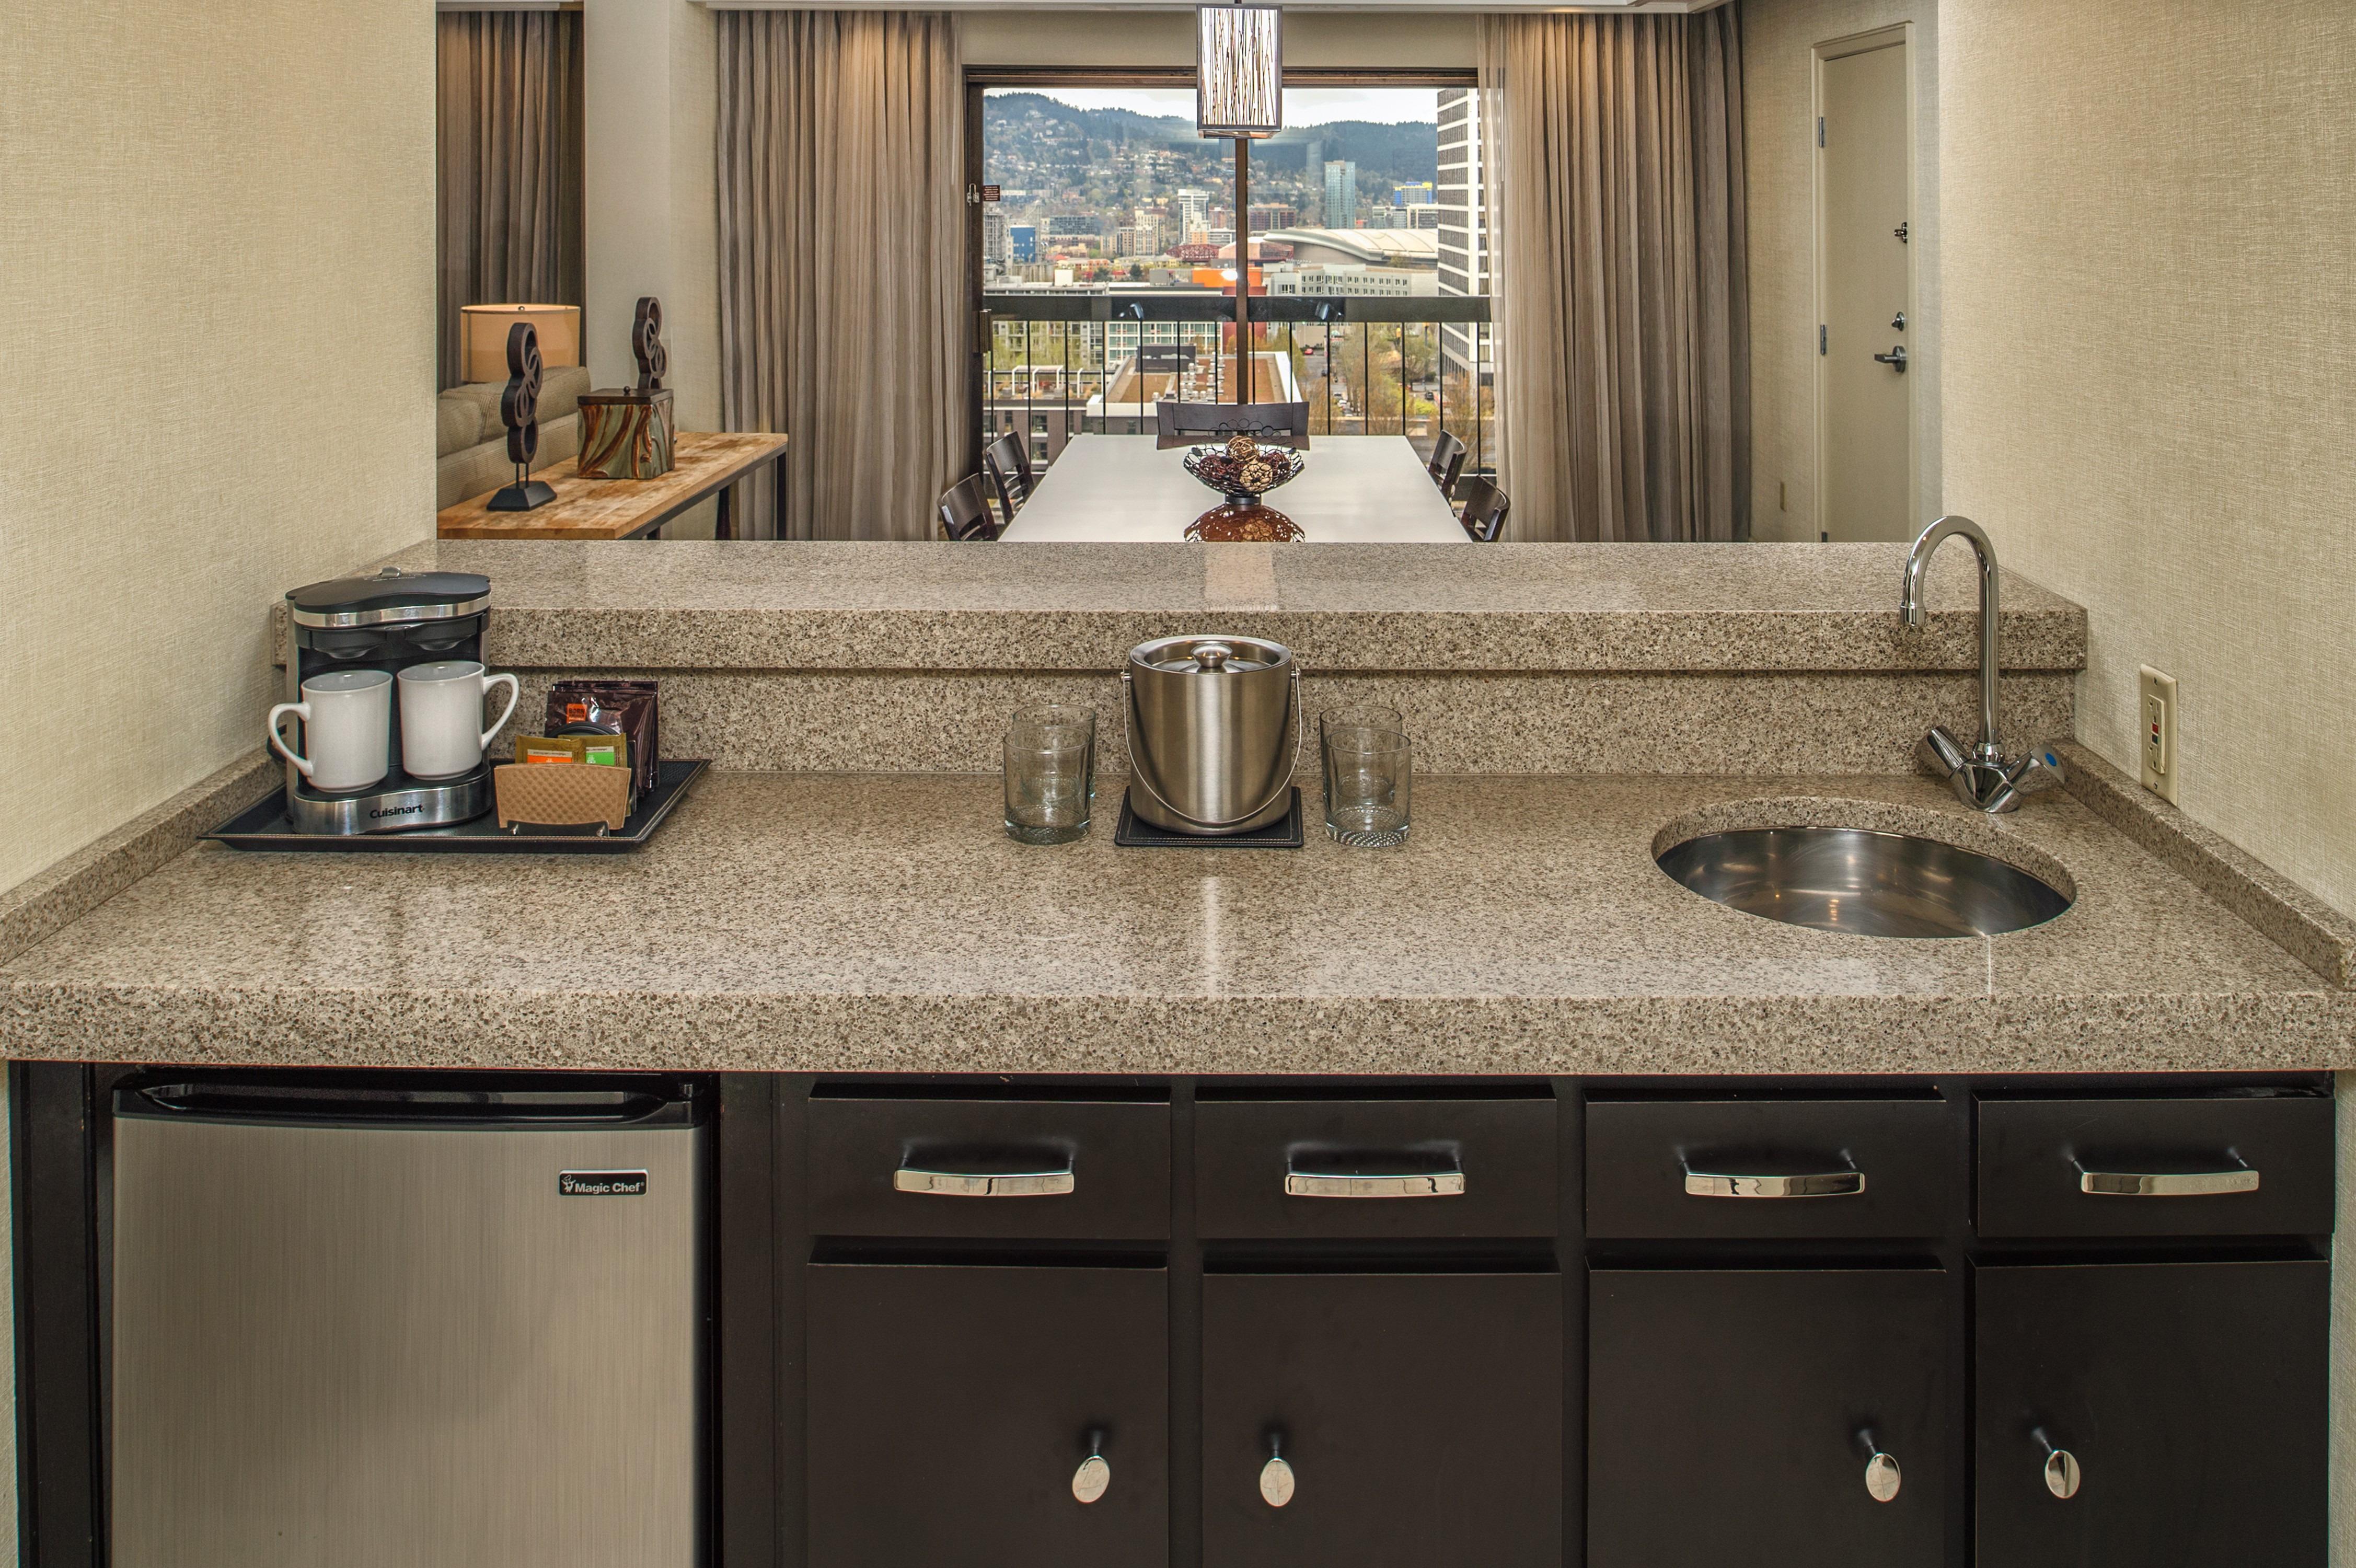 DoubleTree by Hilton Hotel Portland image 4